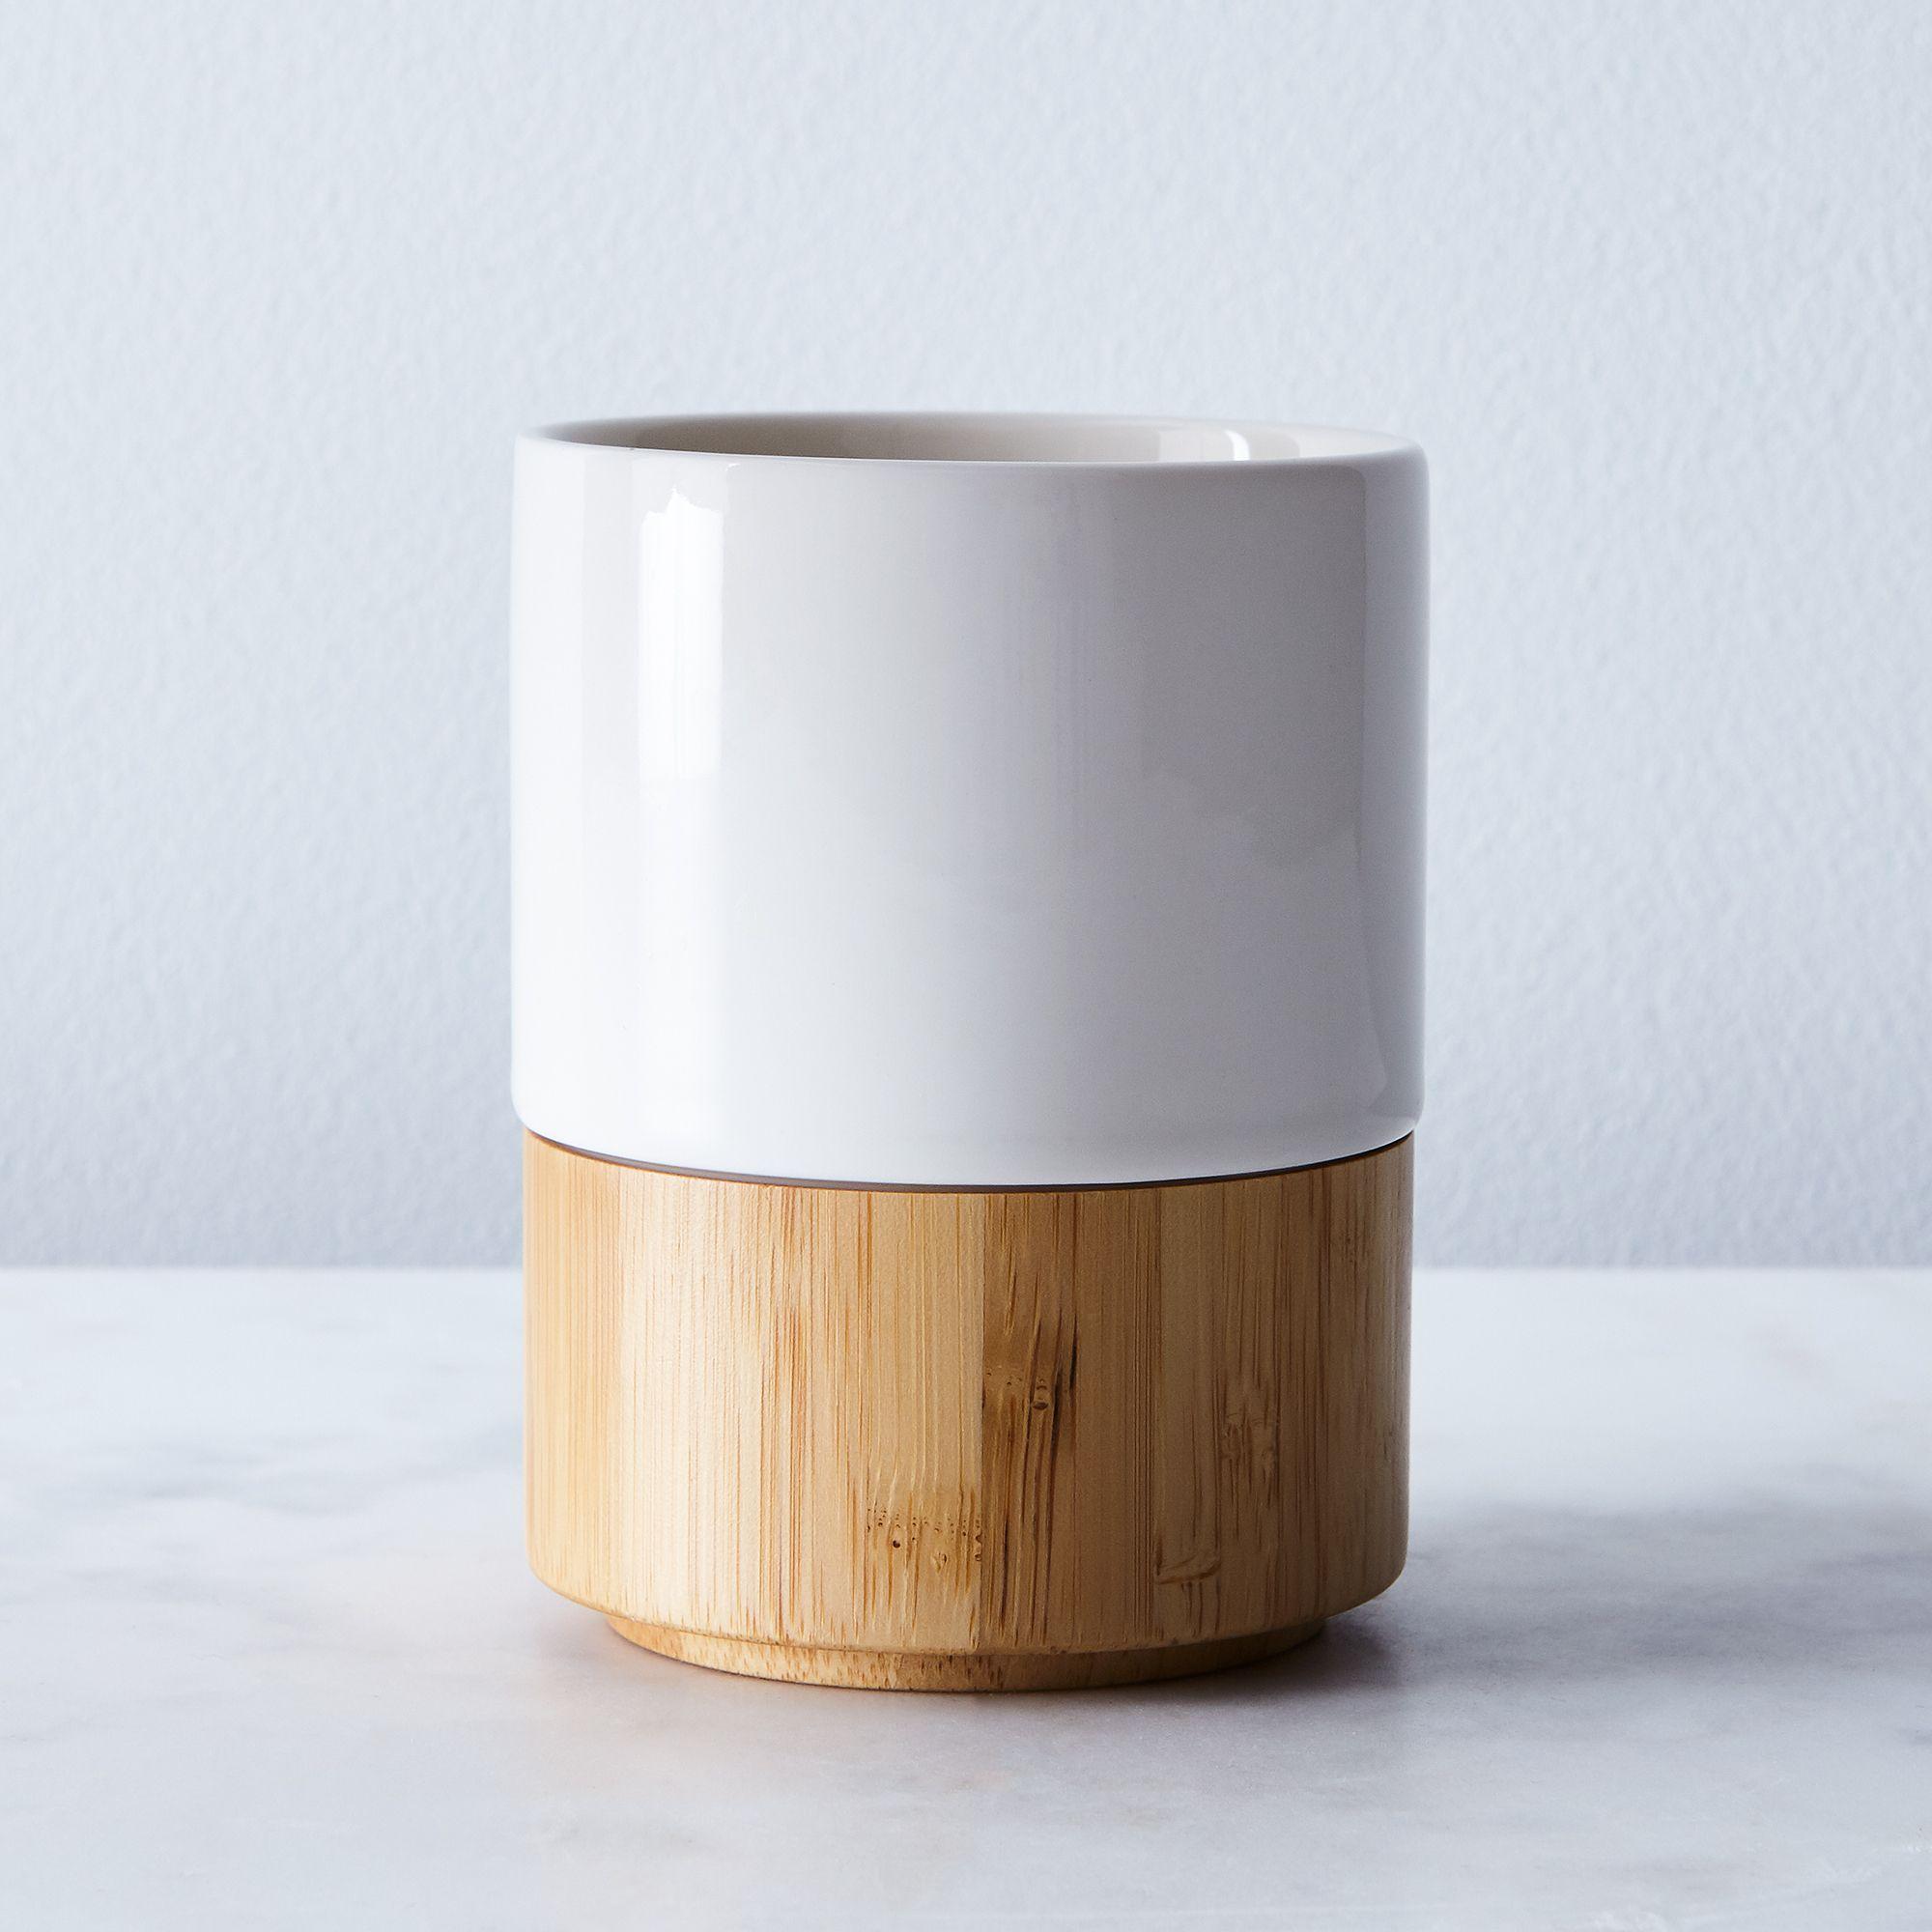 11923648 1b0c 4401 a575 c04453d97e7c  2017 0907 esselle stackable stoneware and bamboo mug white silo rocky luten 002